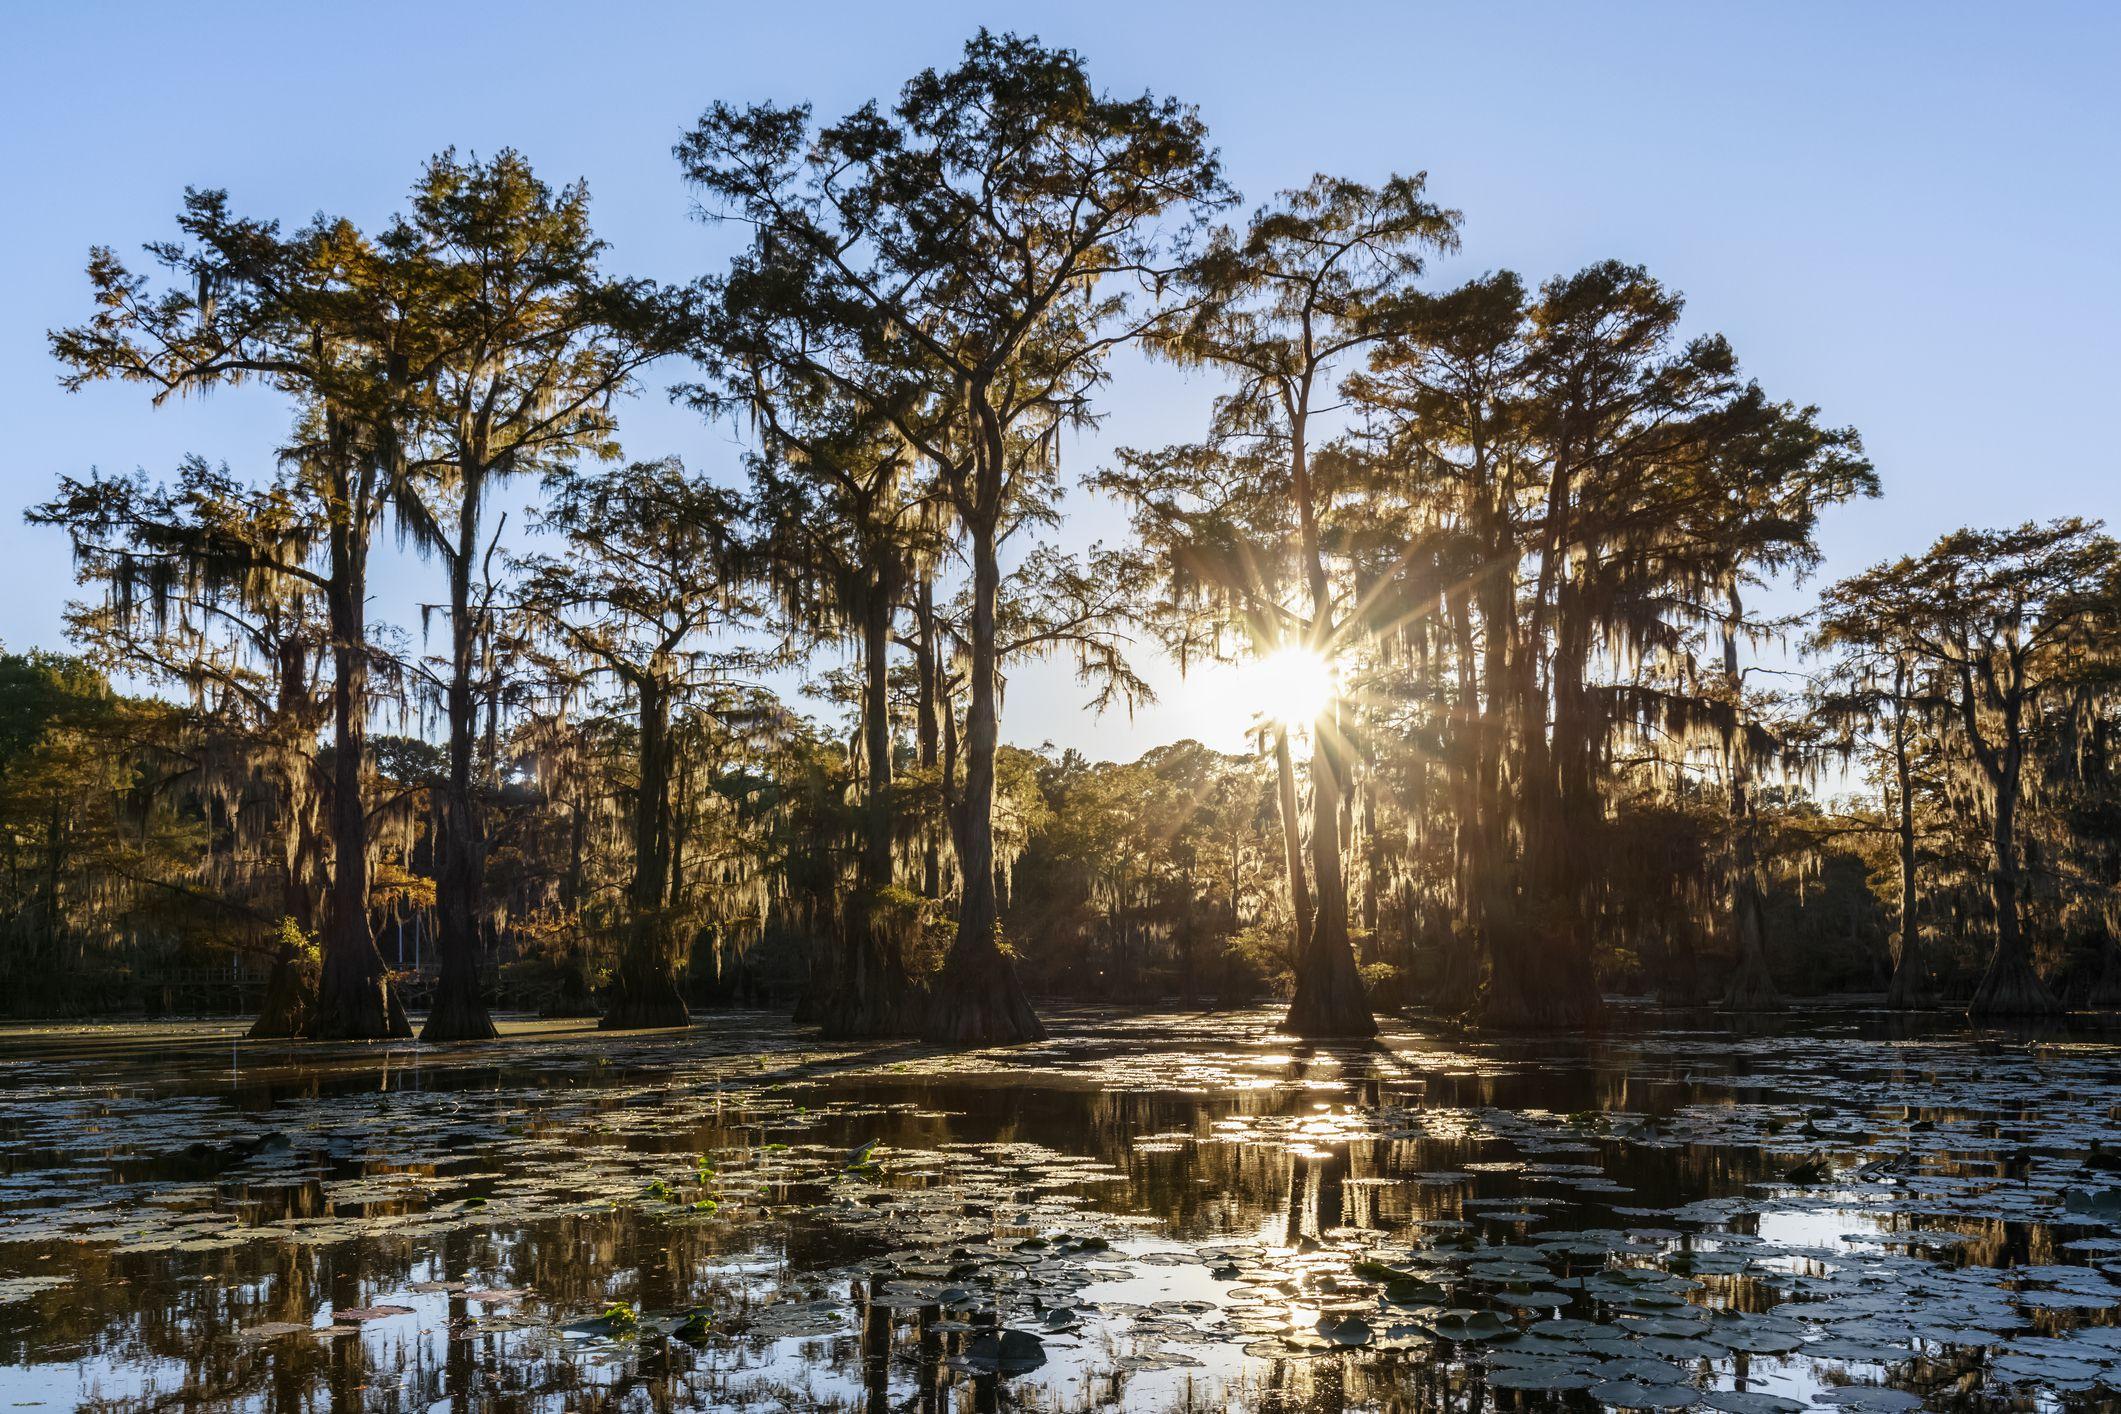 USA, Texas, Louisiana, Caddo Lake State Park, Saw Mill Pond, bald cypress forest